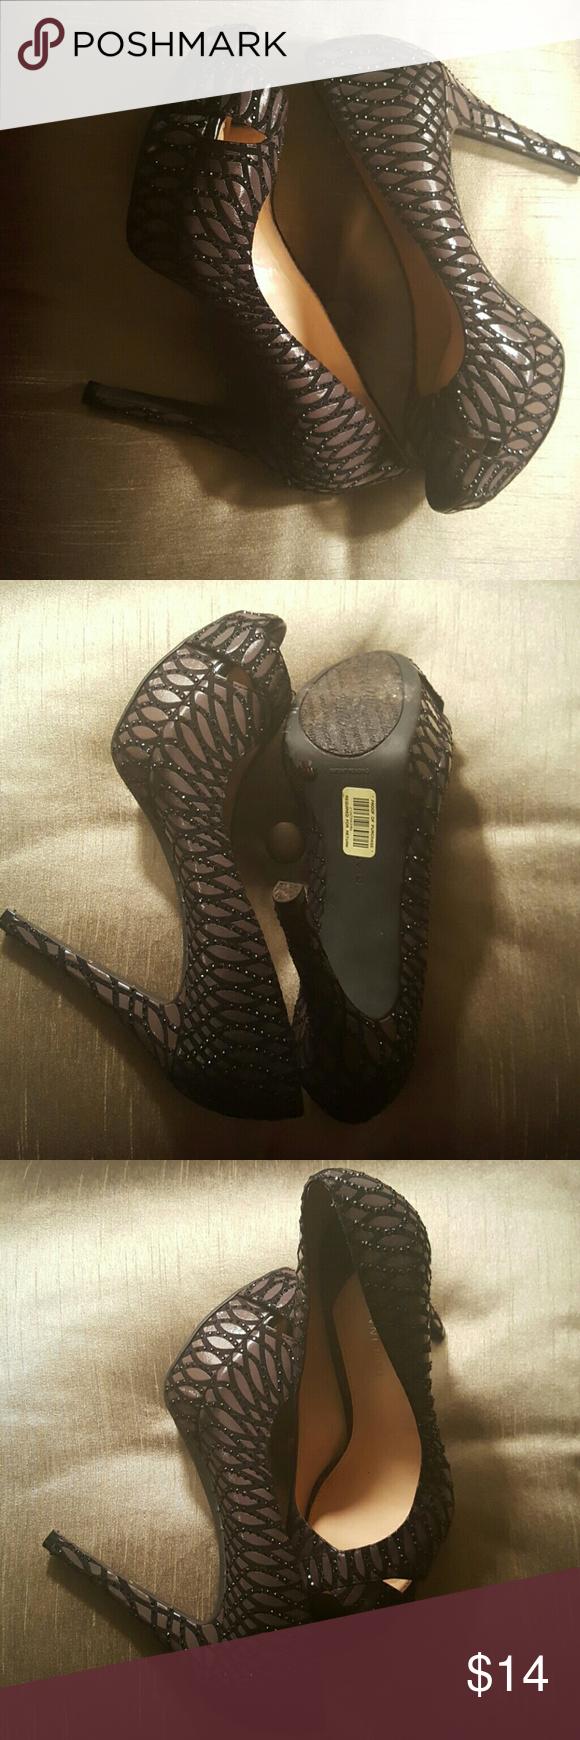 Gianni Bini Black & Brown Heels Gianni Bini Black & Brown Heels. Gently worn. Good condition. Giani Bernini Shoes Heels